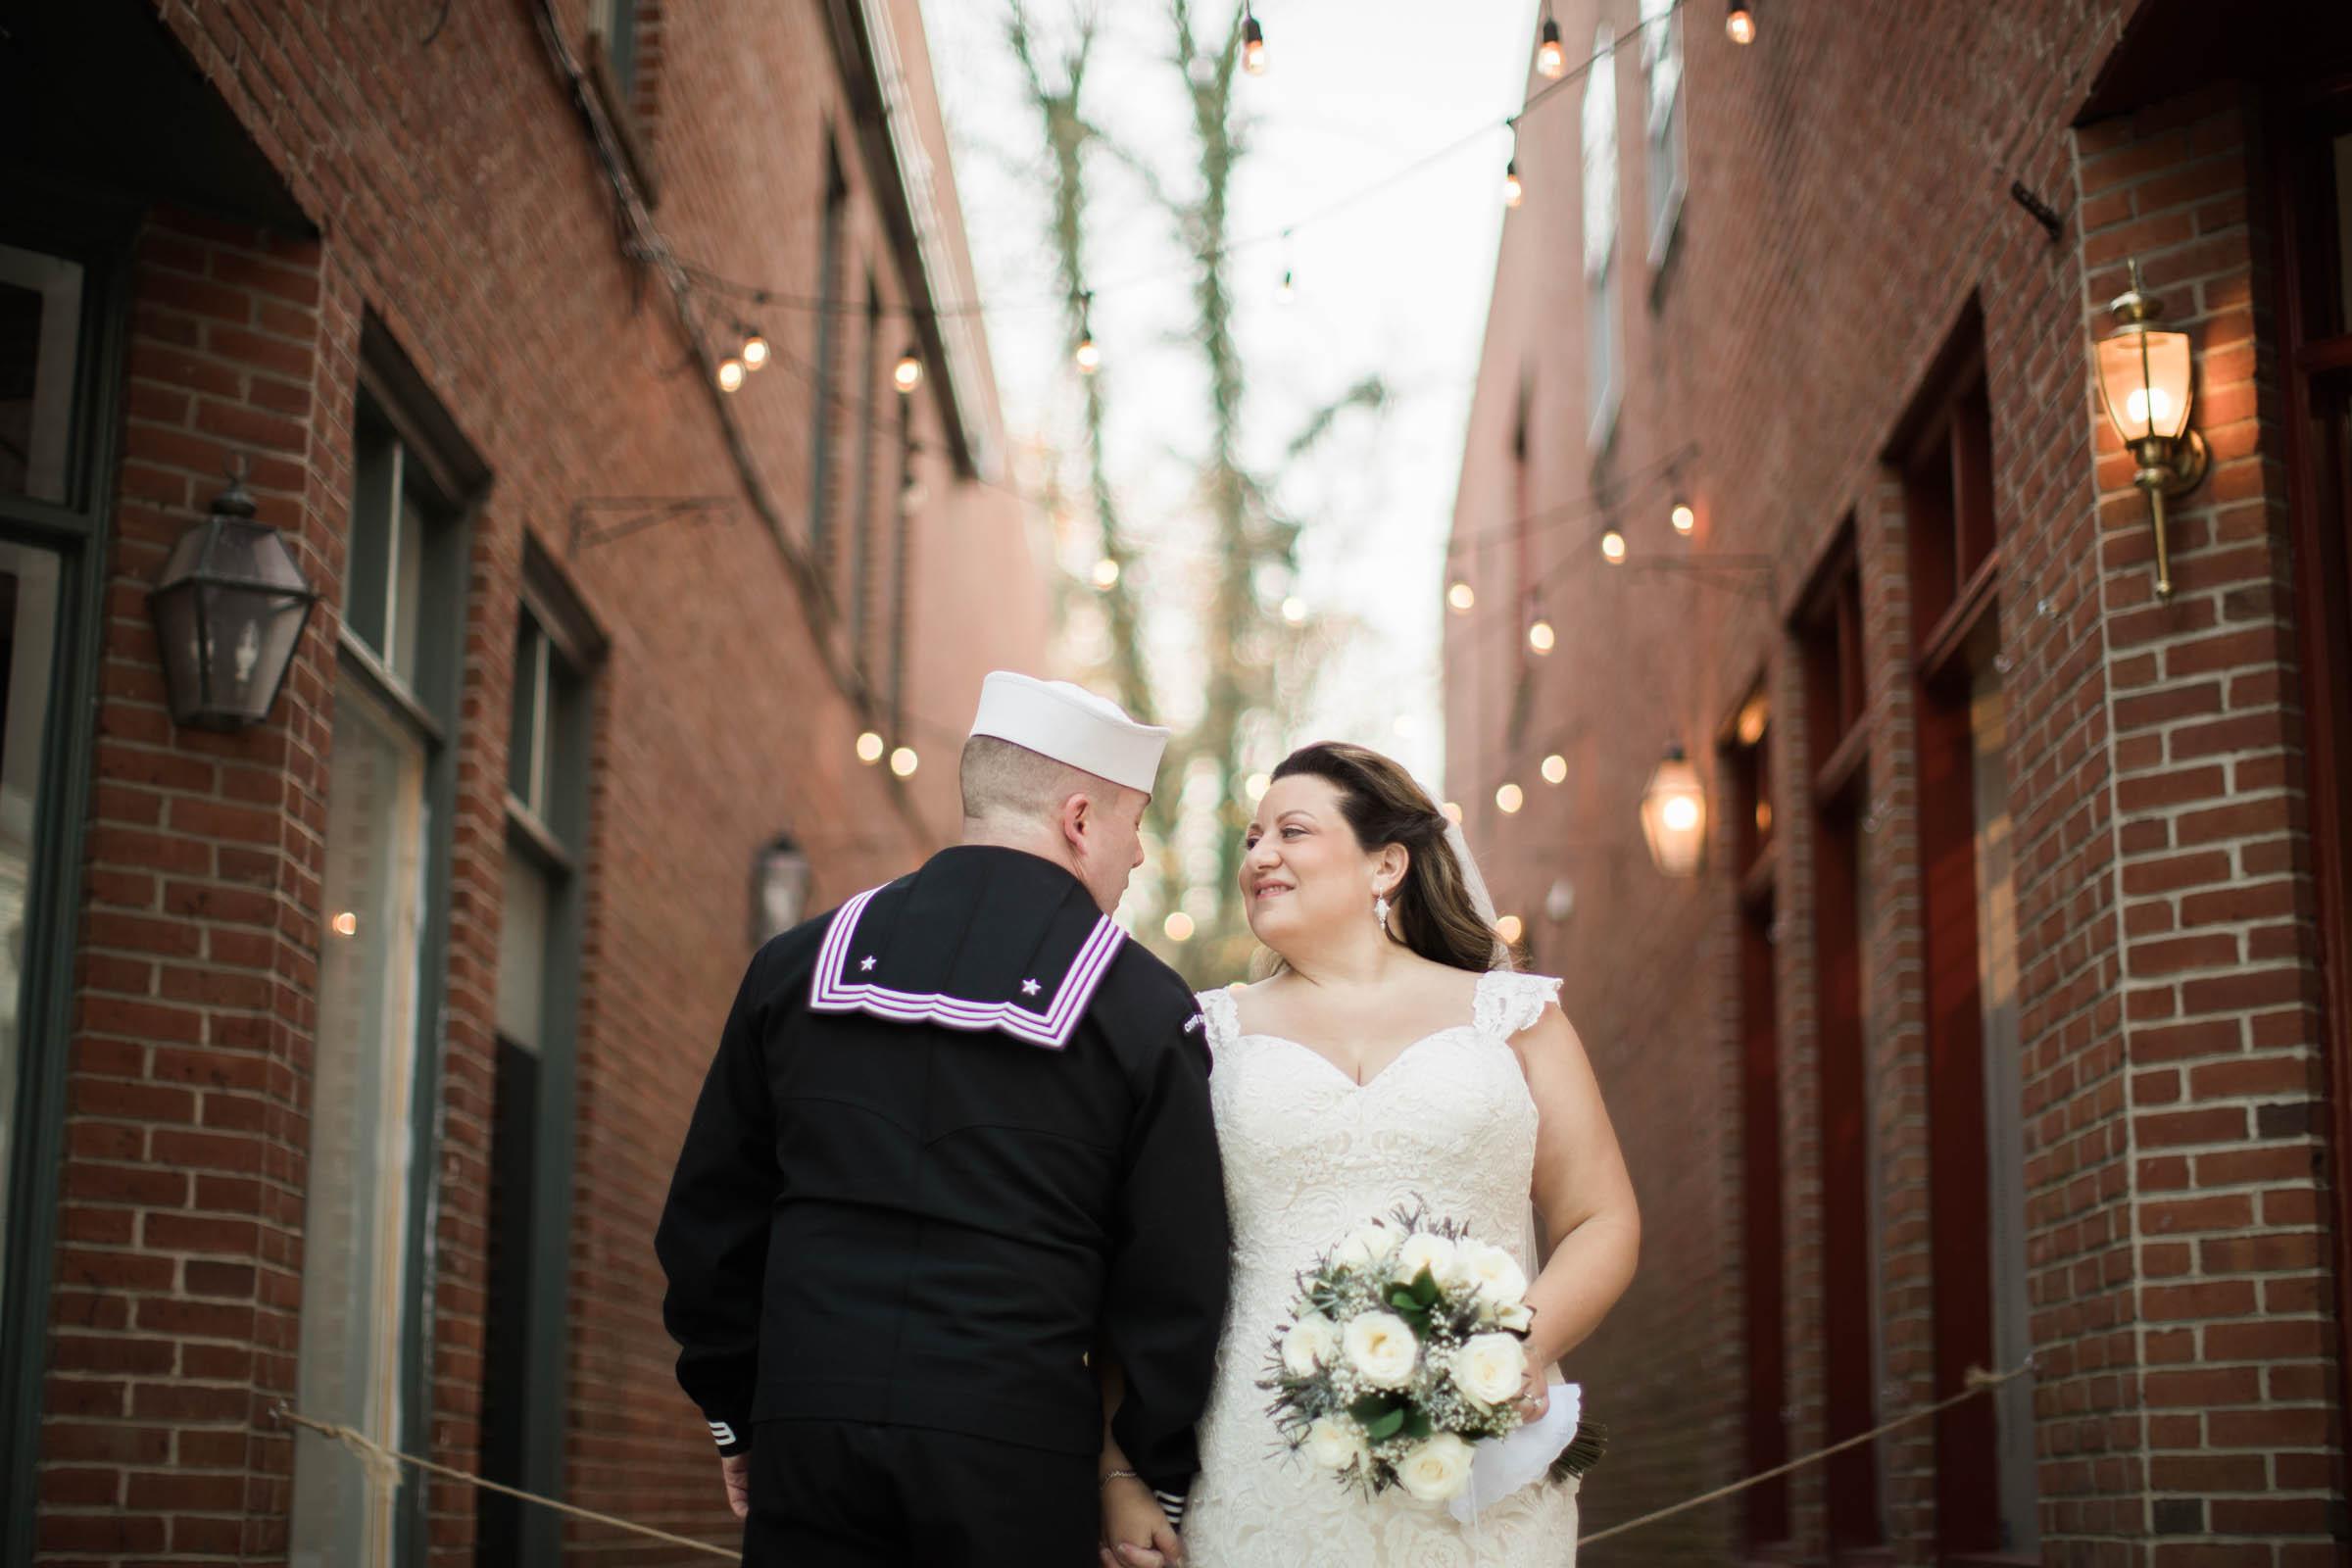 Best Wedding Photographers in Baltimore Maryland Megapixels Media PHOTOGRAPHY (15 of 25).jpg